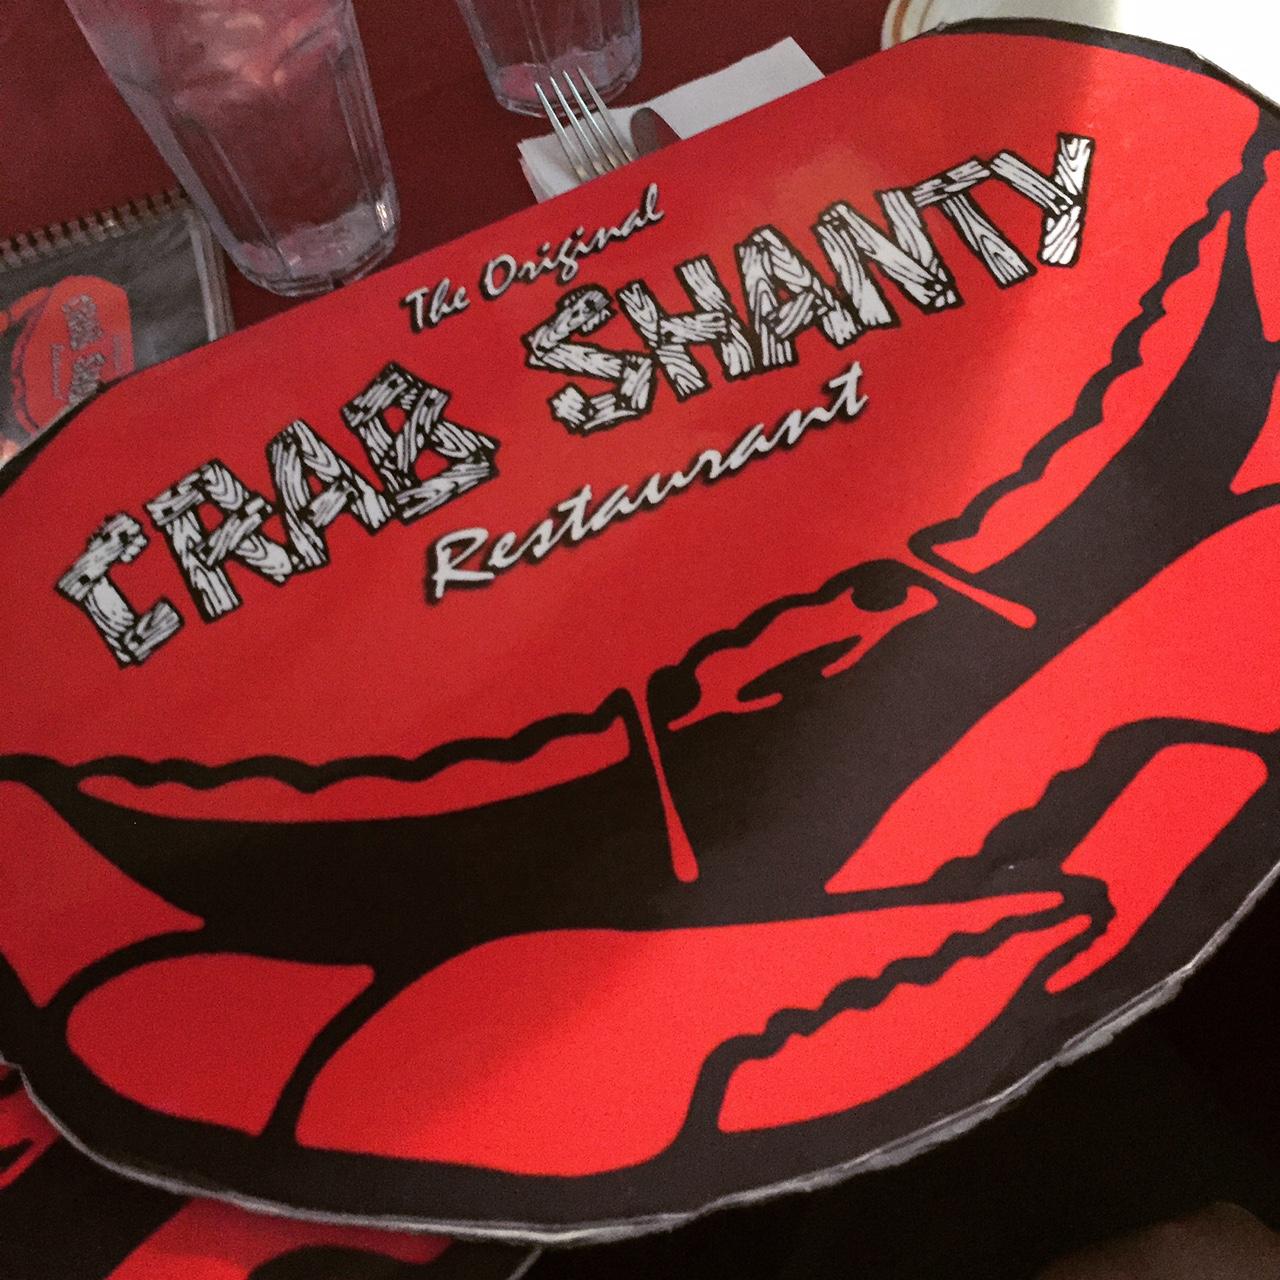 crab shanty